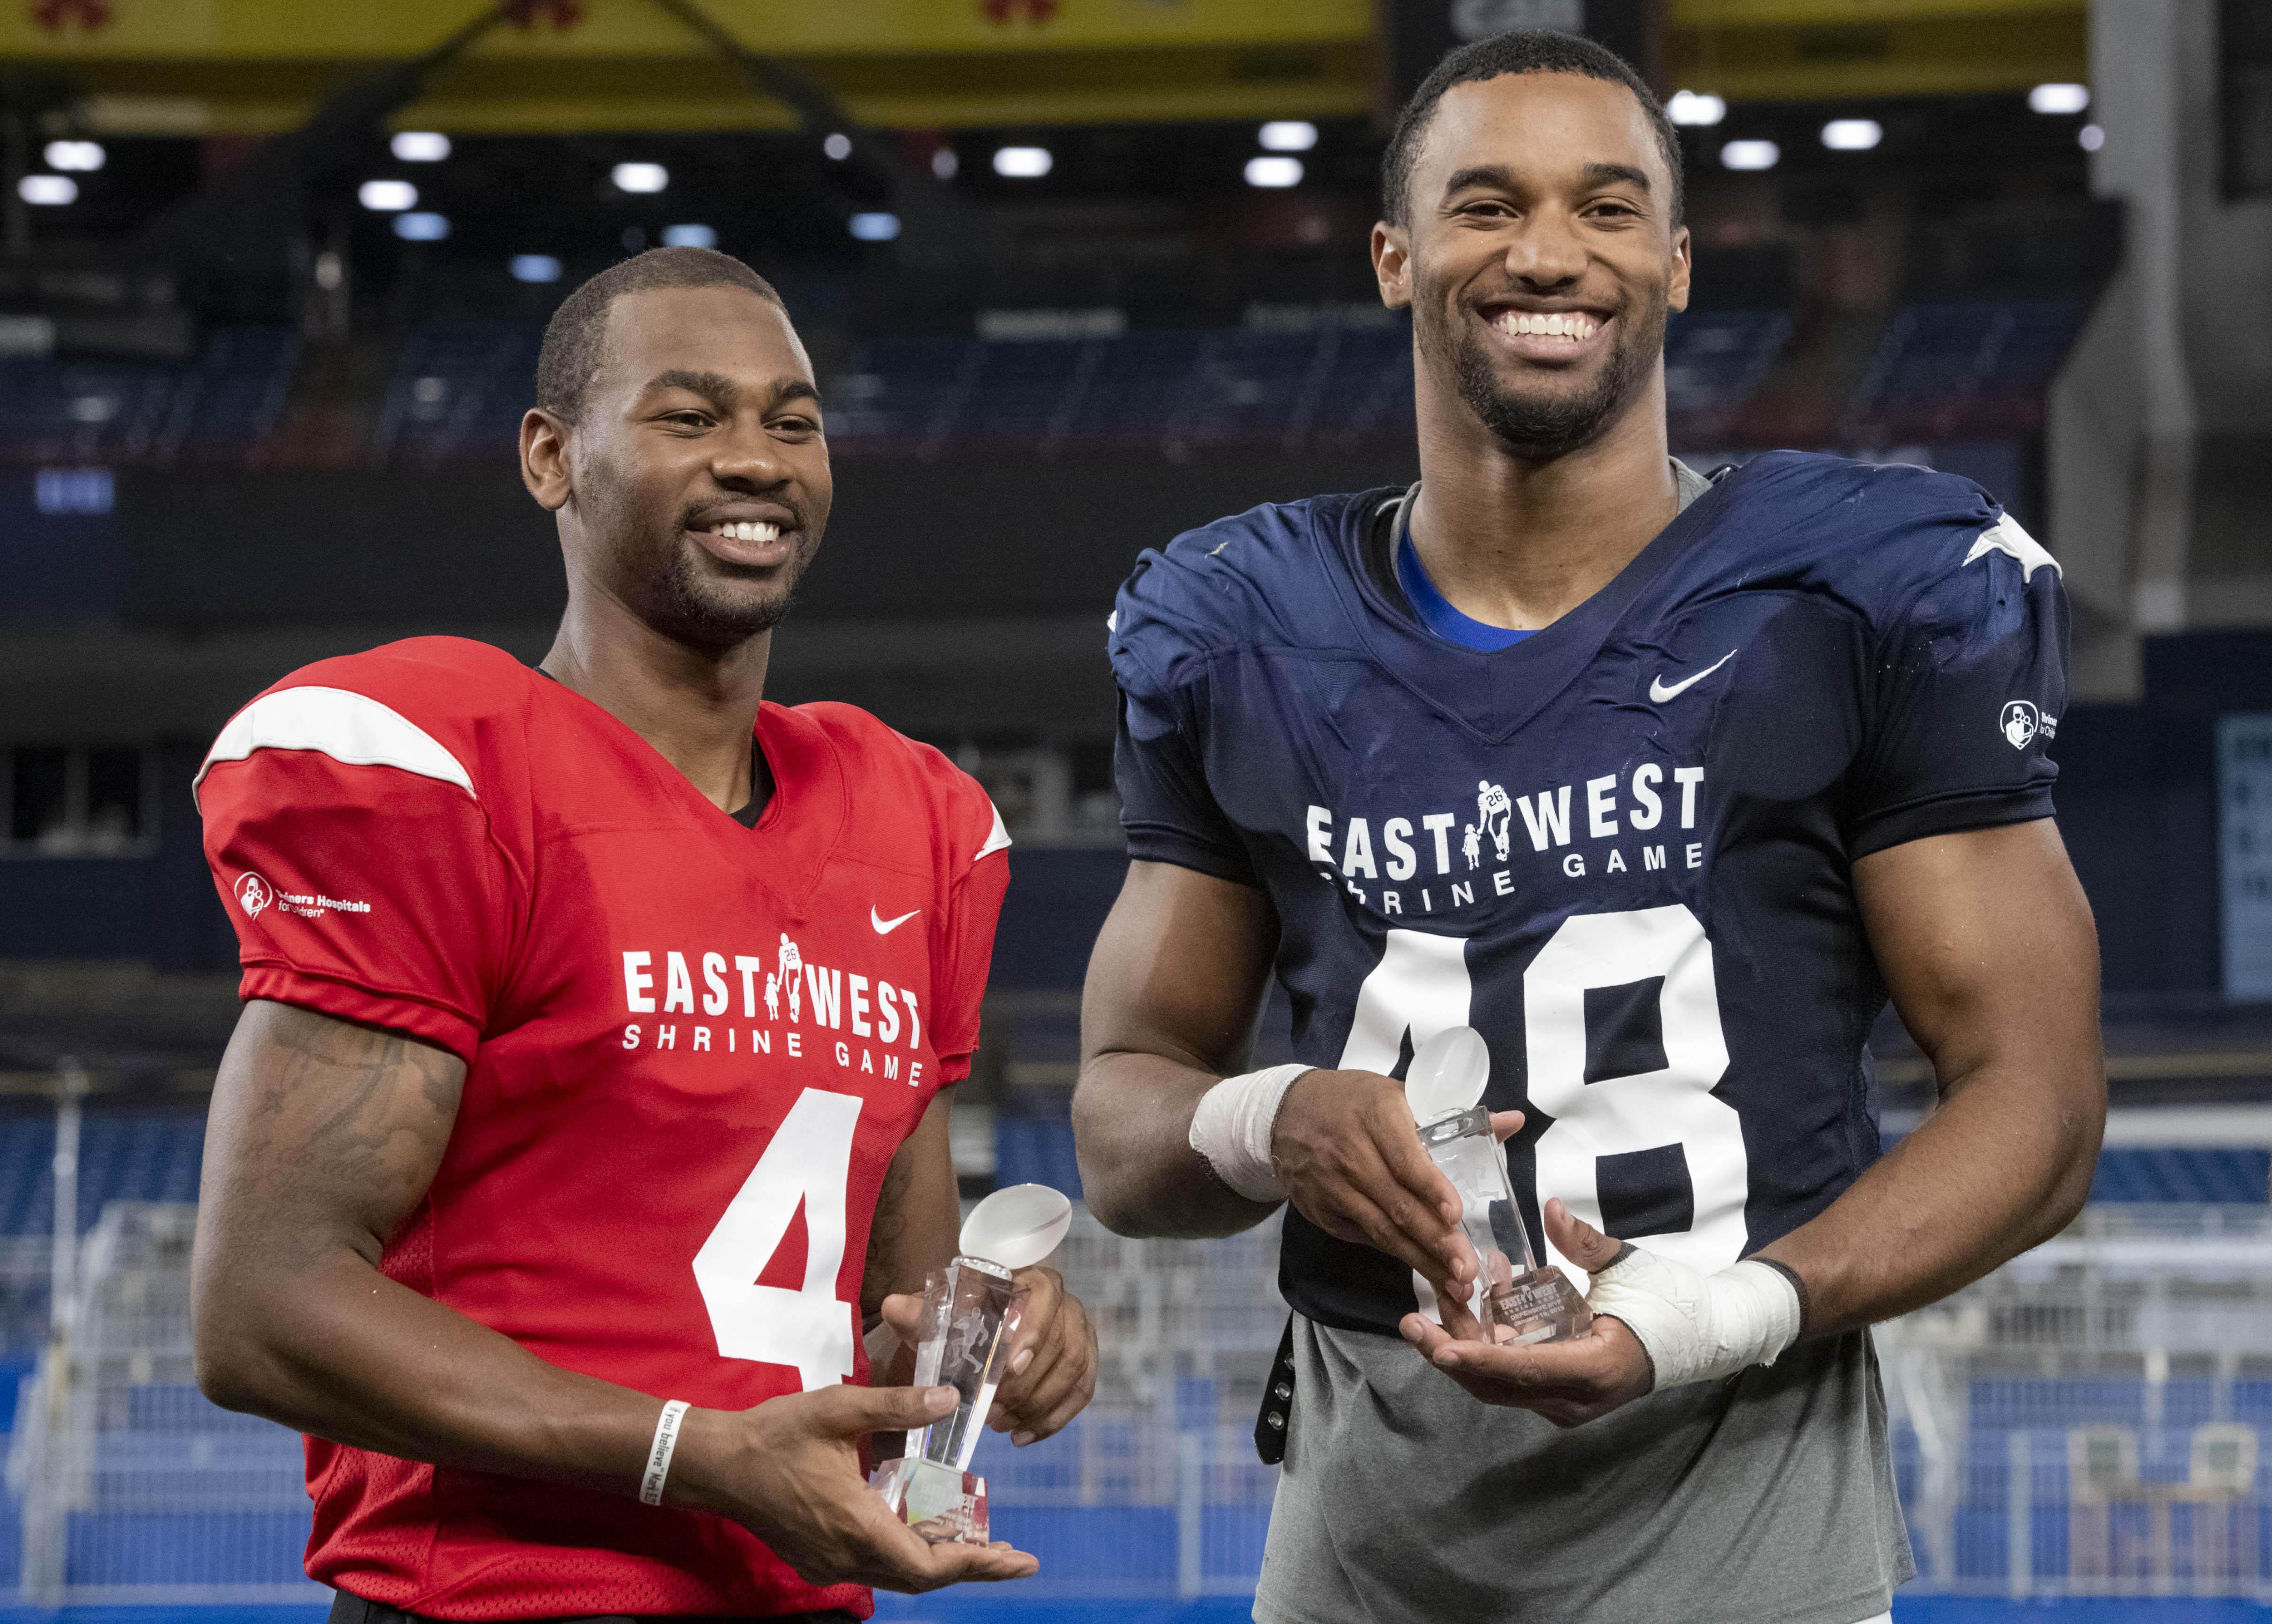 NCAA Football: East/West Shrine Game